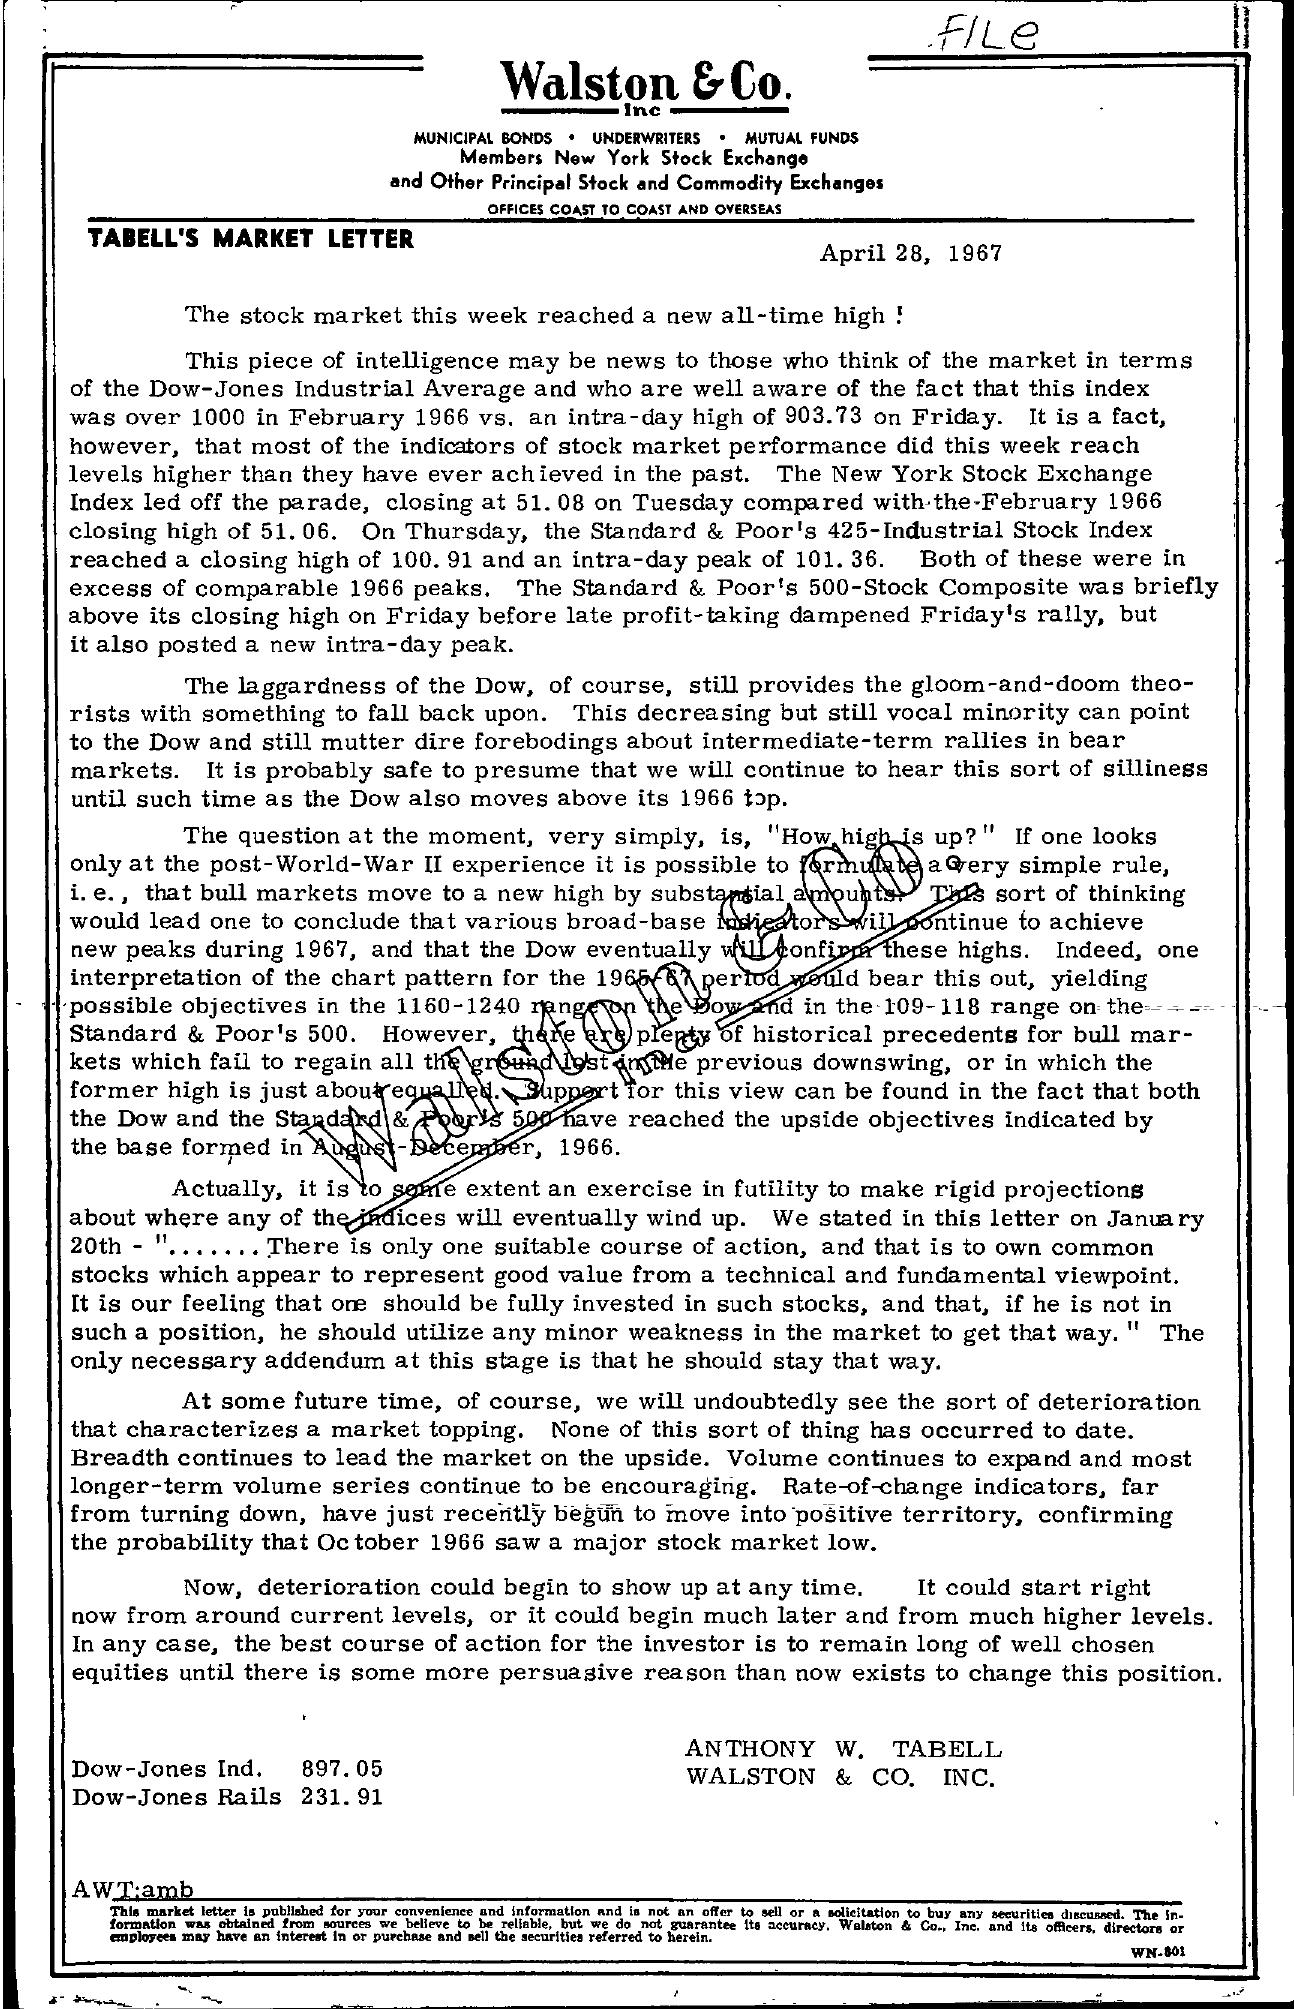 Tabell's Market Letter - April 28, 1967